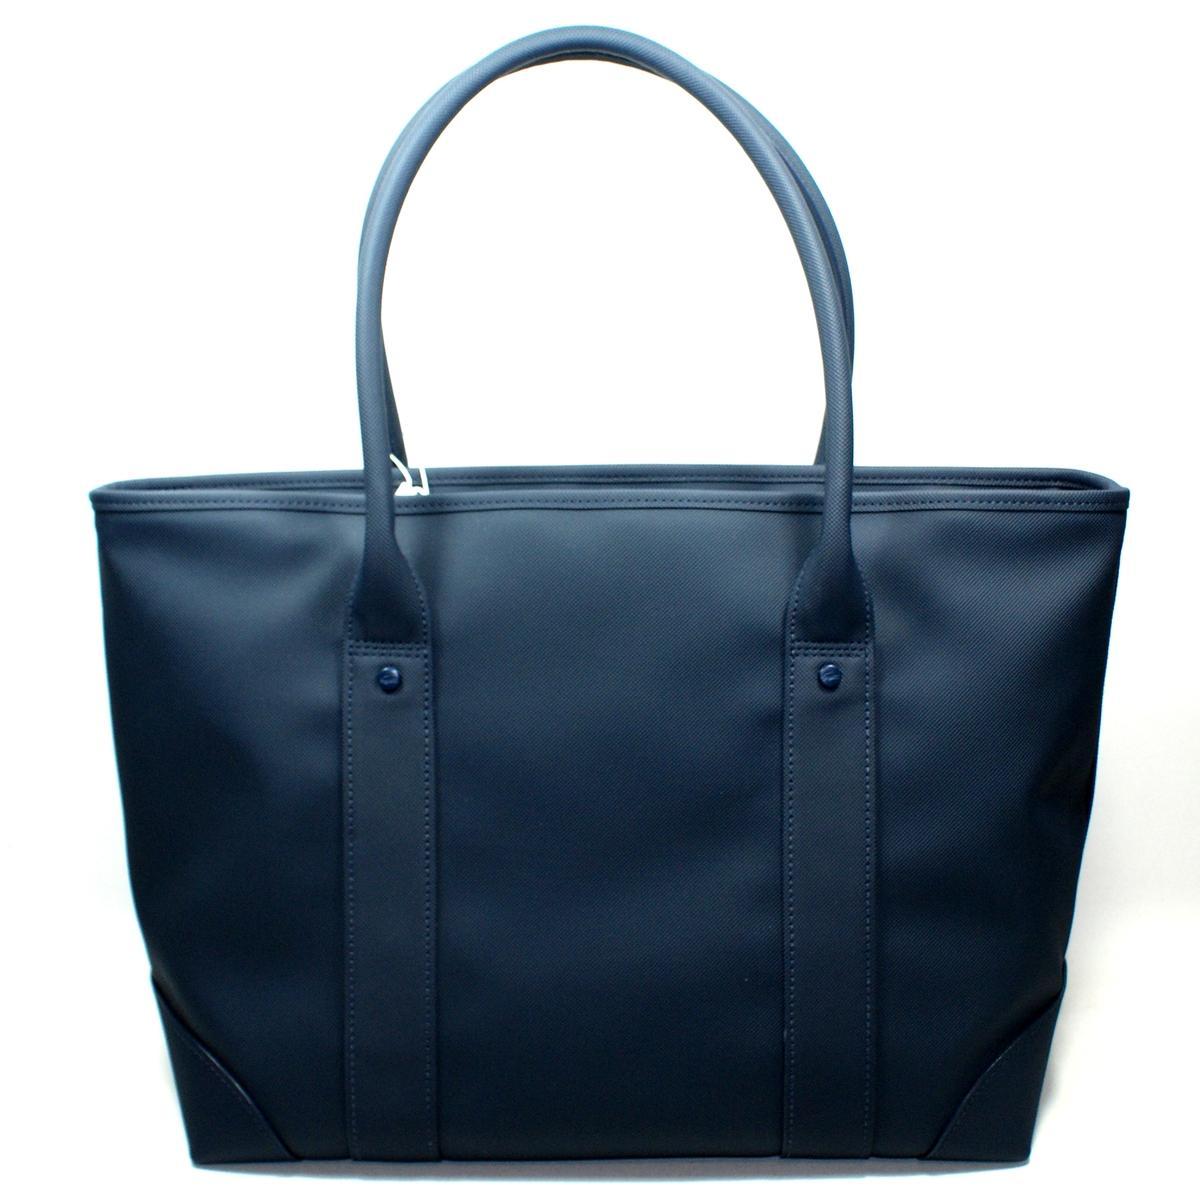 Lacoste Black Iris Shopping Bag/ Tote Bag #NF0001NC : Lacoste NF0001NC